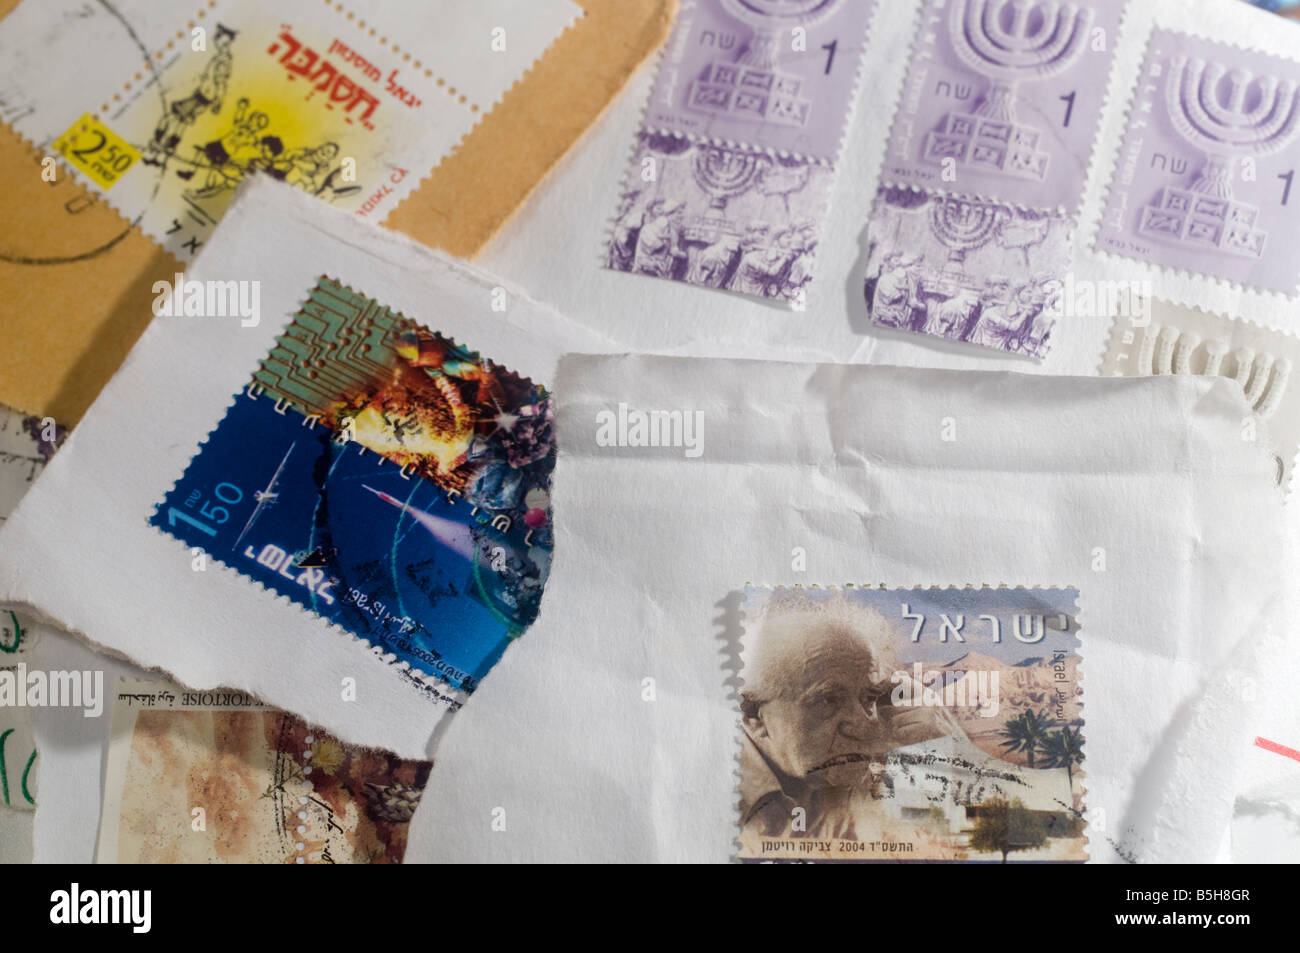 Israeli Stamp - Stock Image